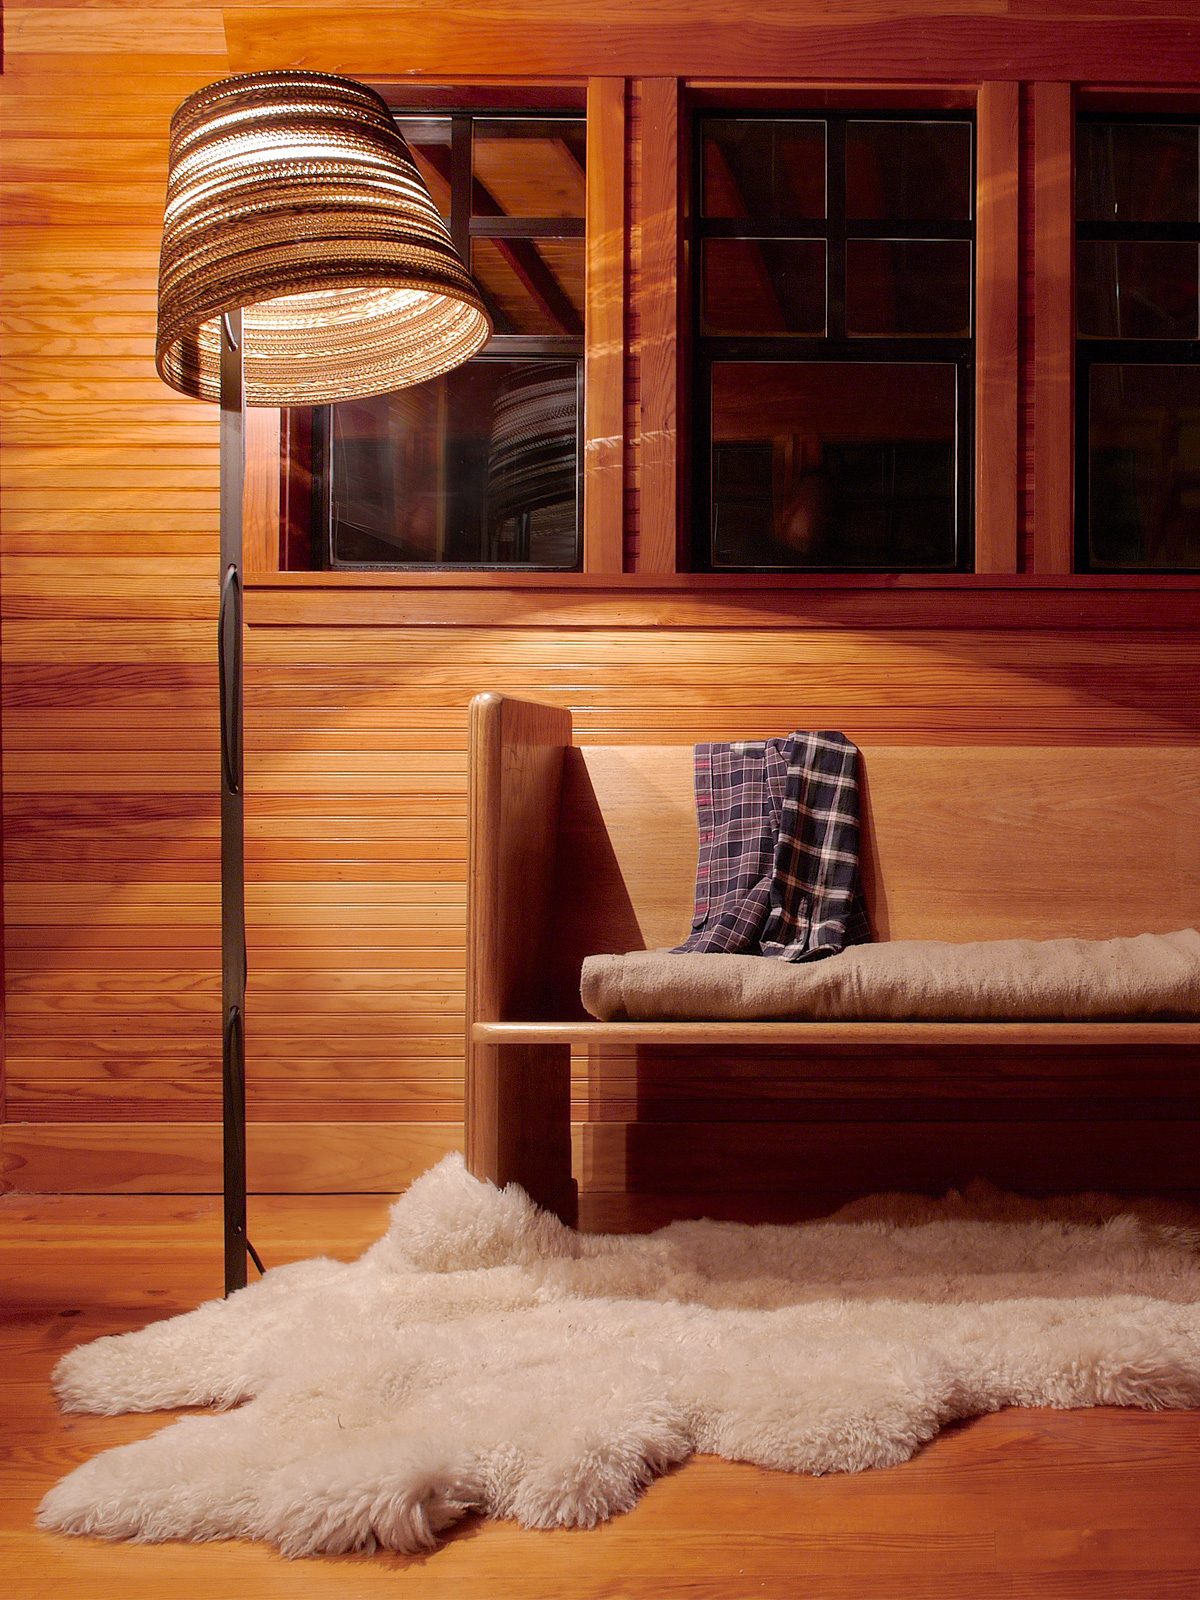 Scraplights tilt floor lamp im Raum